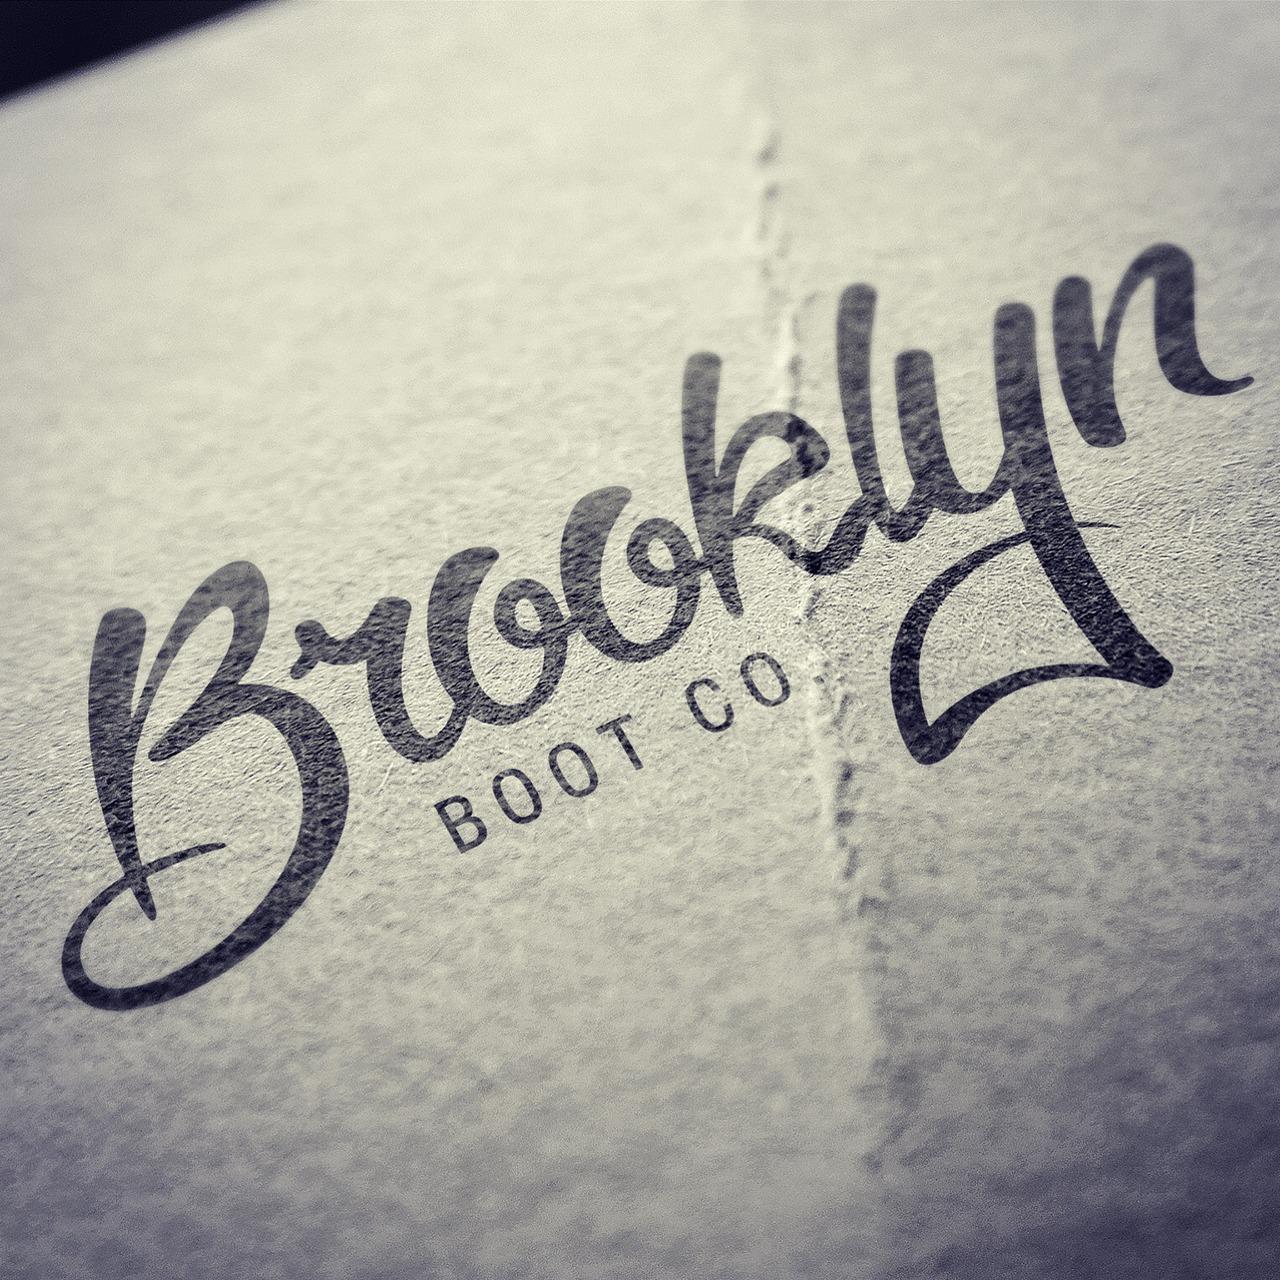 Brooklyn Boot Co.